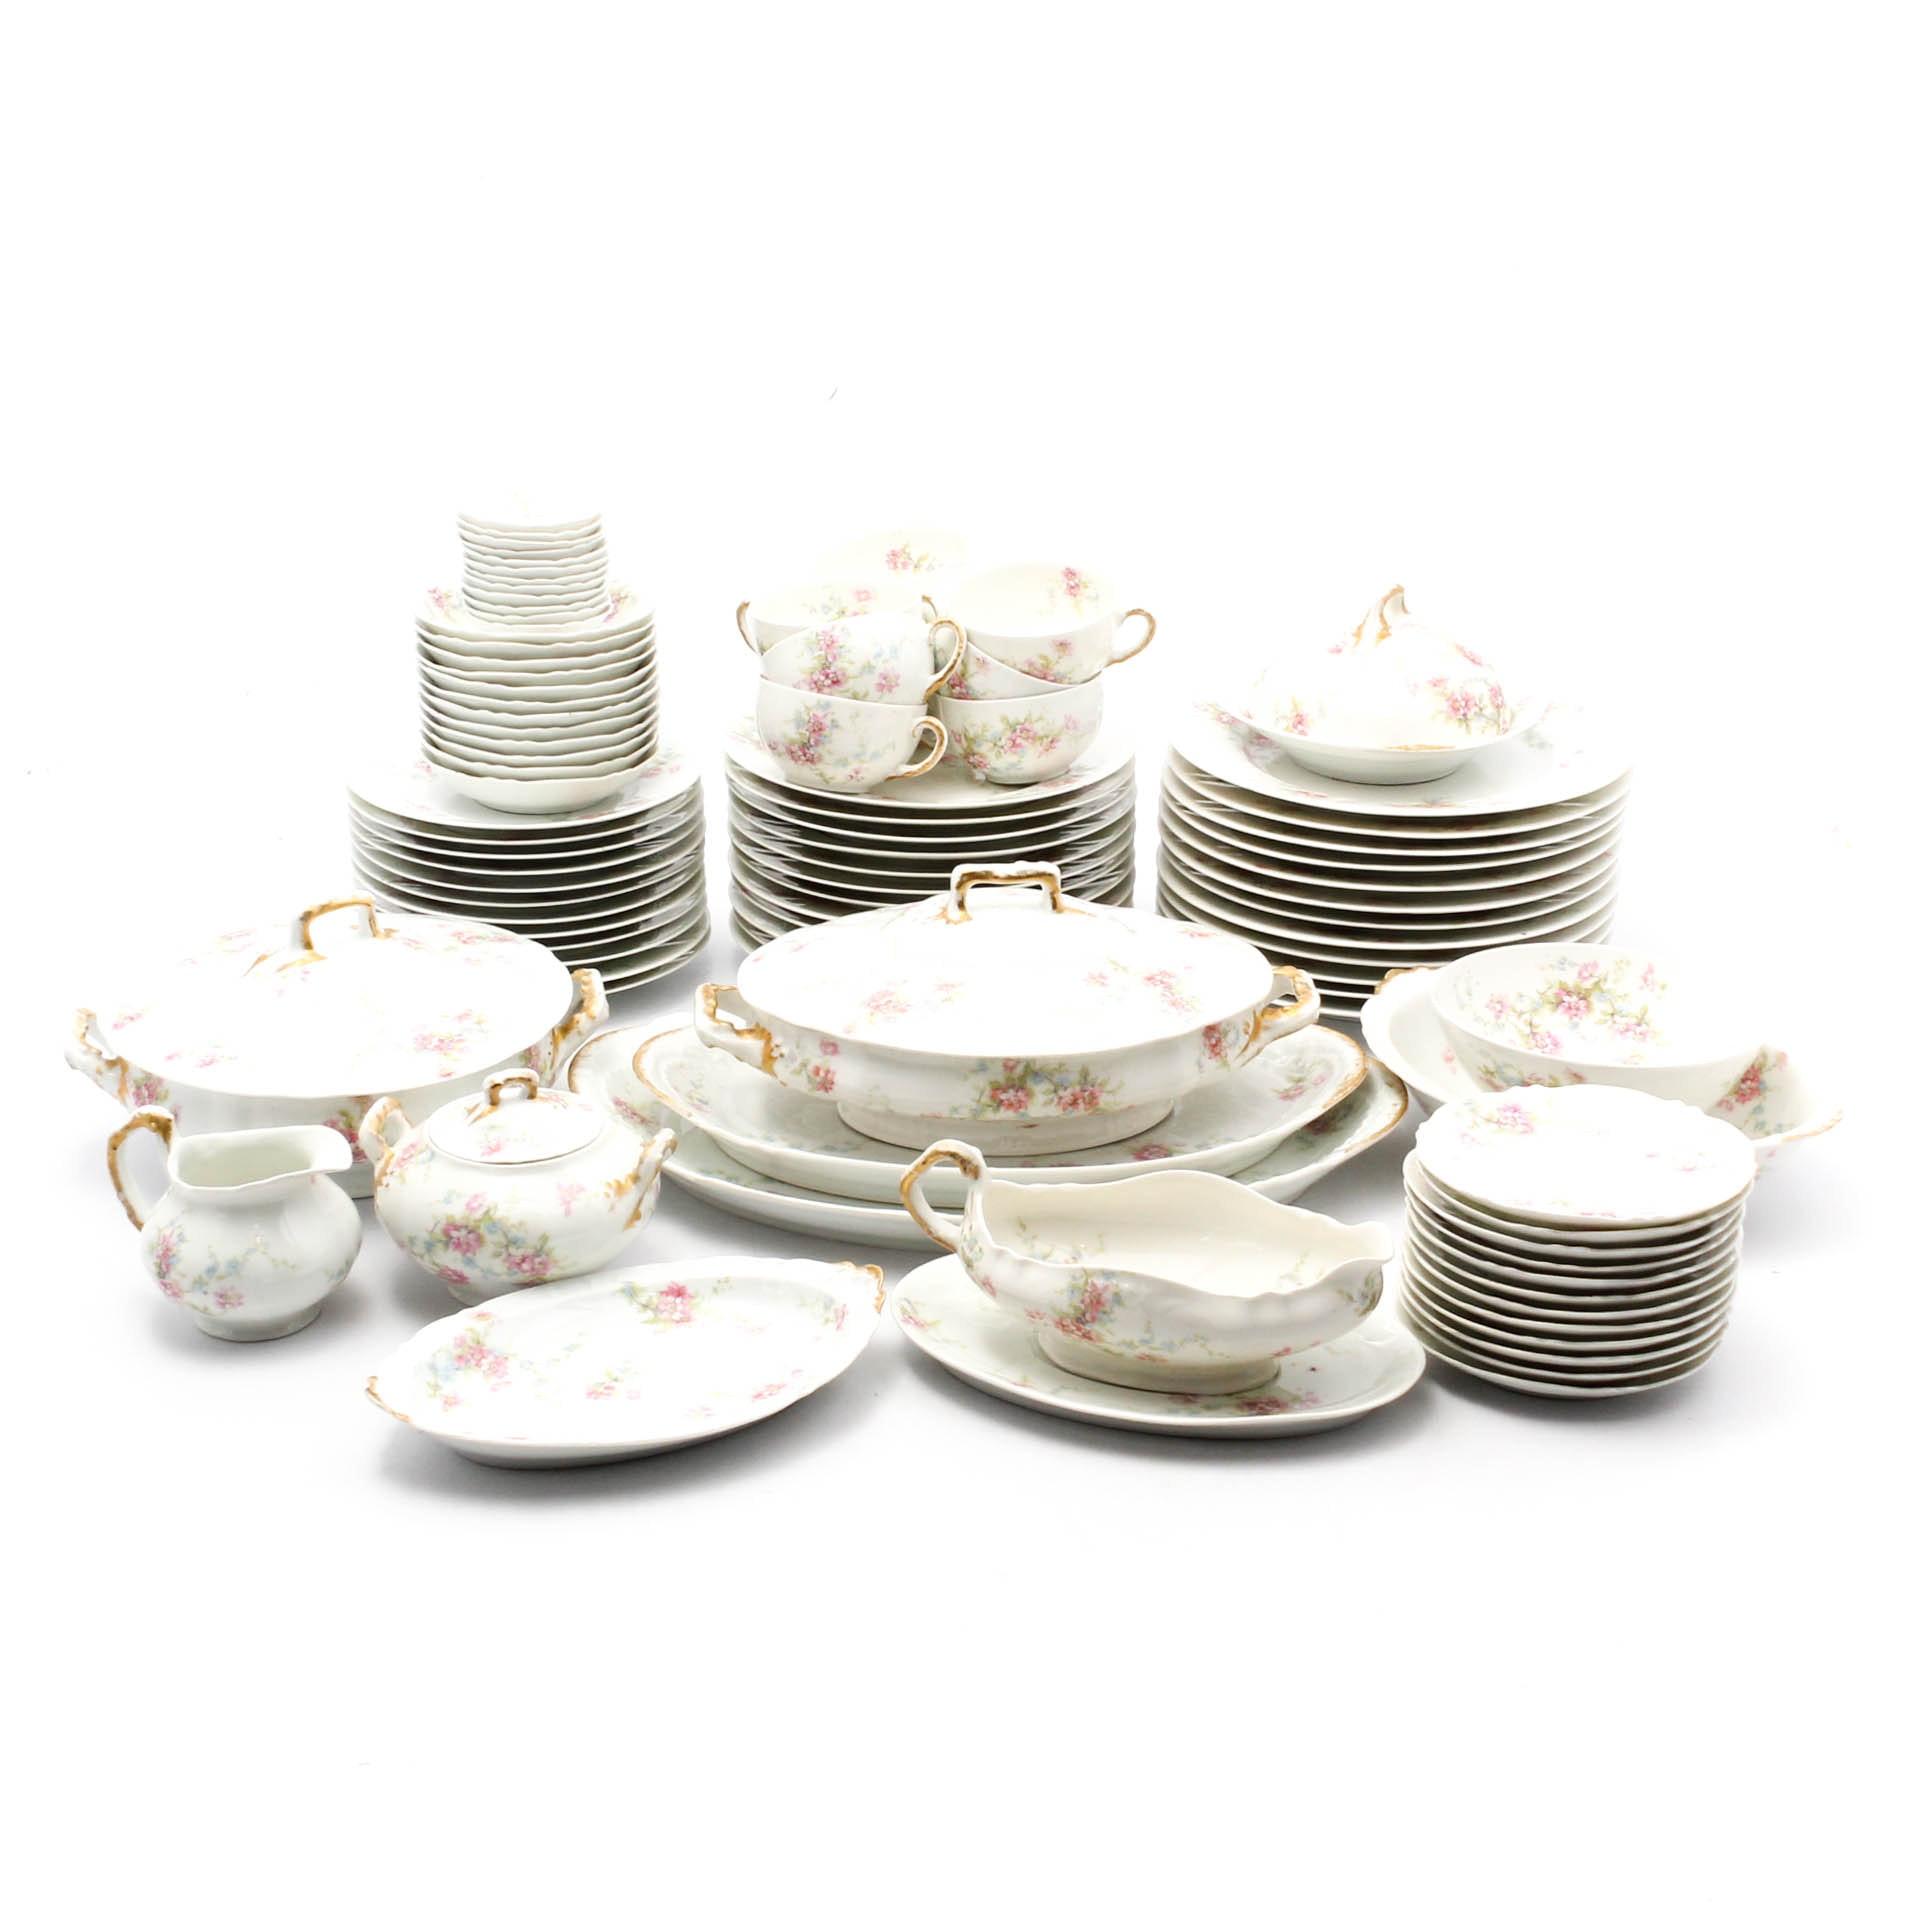 Theodore Haviland Limoges Dinnerware Set for Twelve